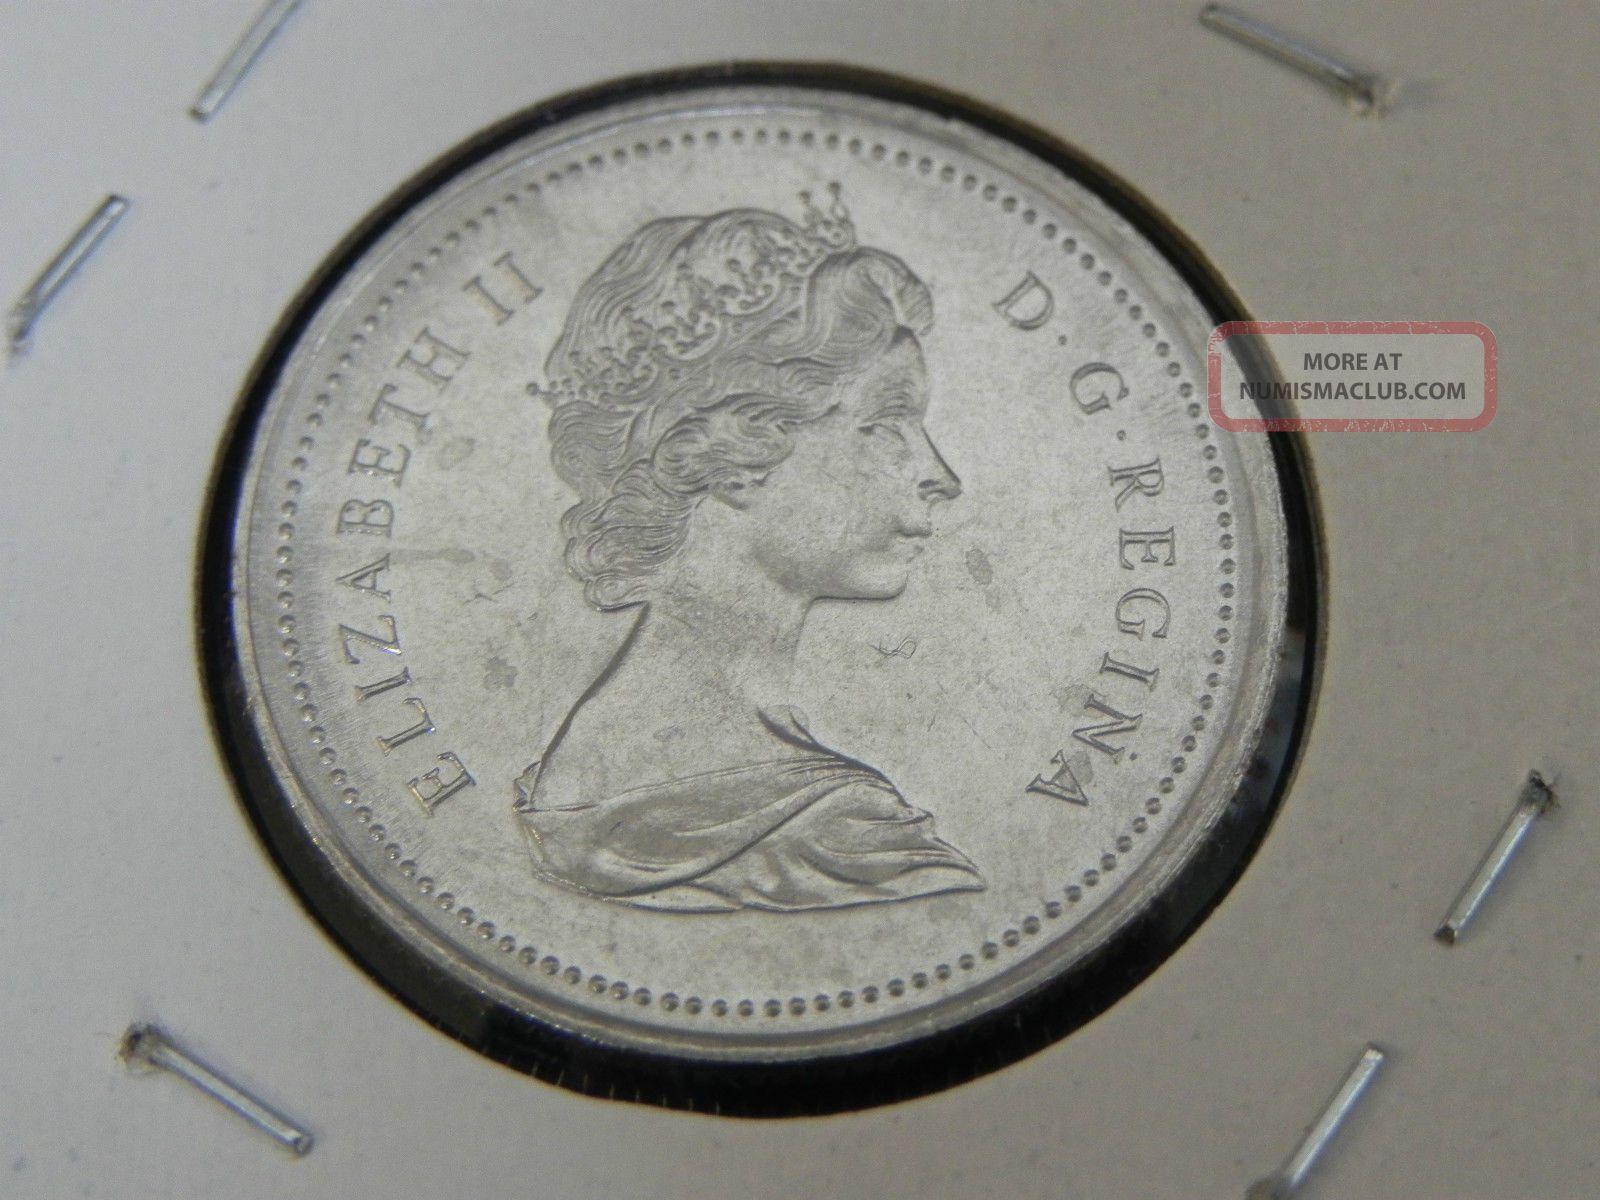 1973 Ms Unc Canadian Canada Rcmp Mountie Quarter Twenty Five 25 Cent Small Bust